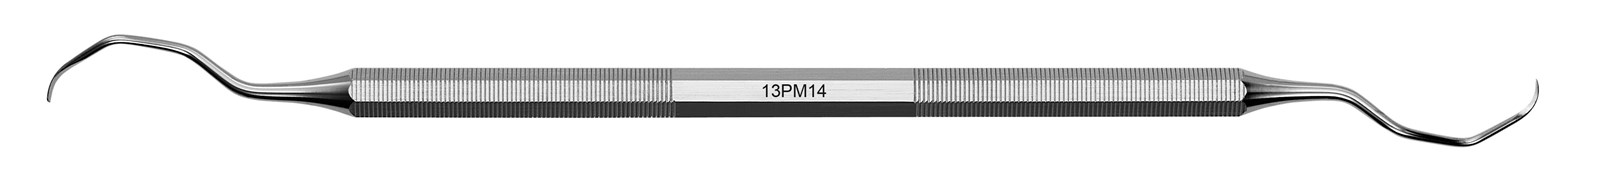 Kyreta Gracey Mini - 13PM14, ADEP světle modrý